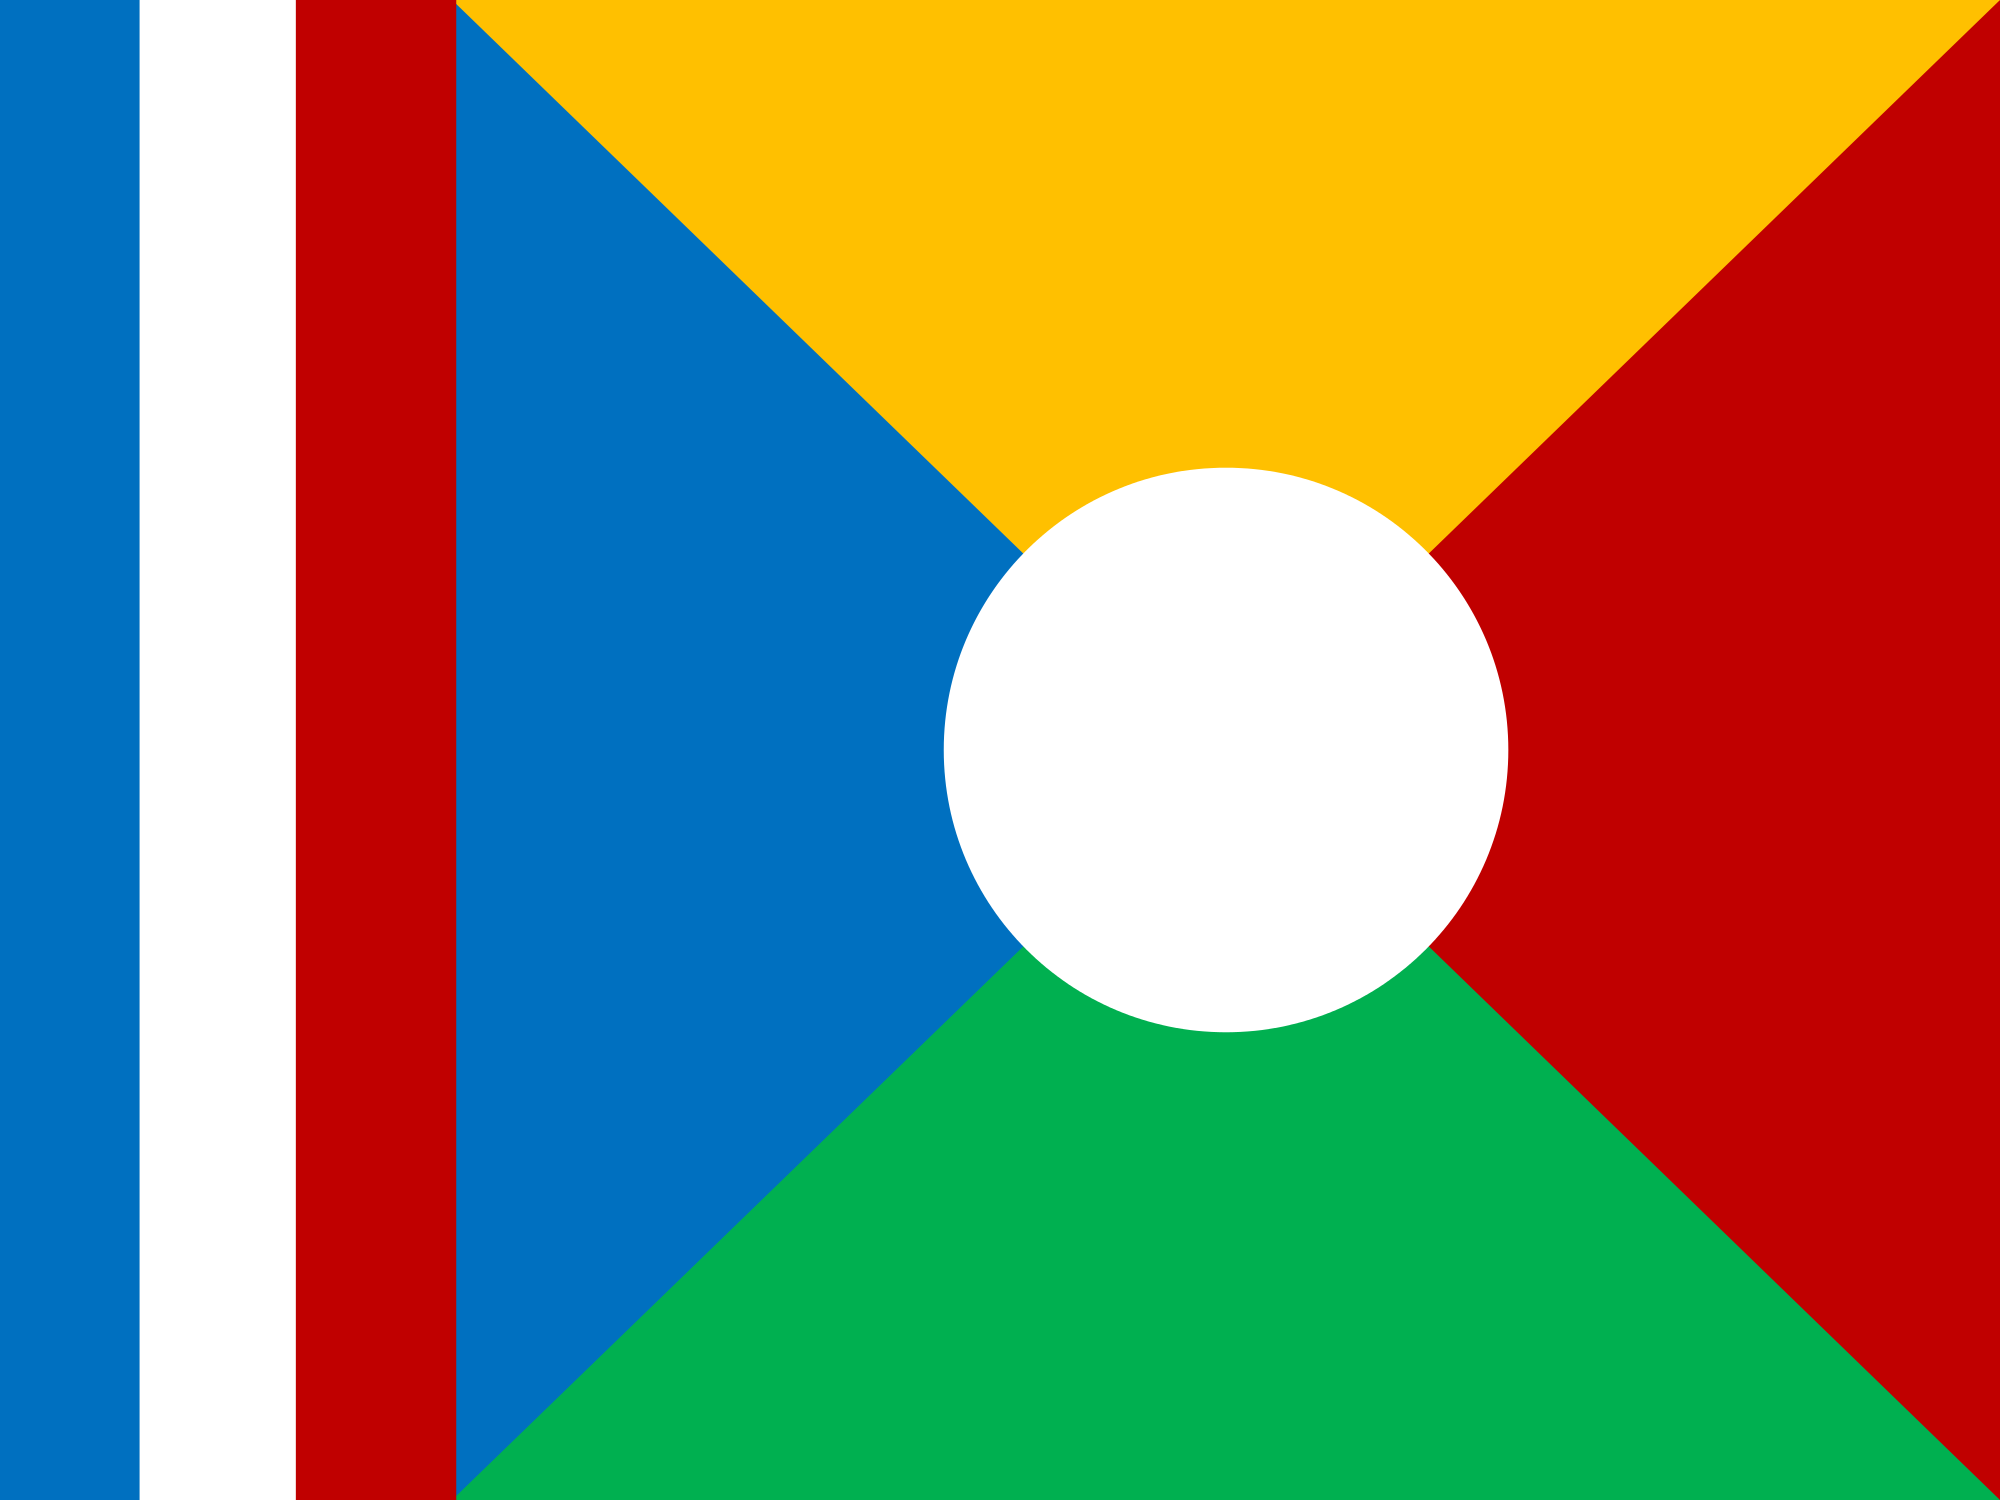 reunión, país, emblema, insignia, símbolo - Fondos de Pantalla HD - professor-falken.com